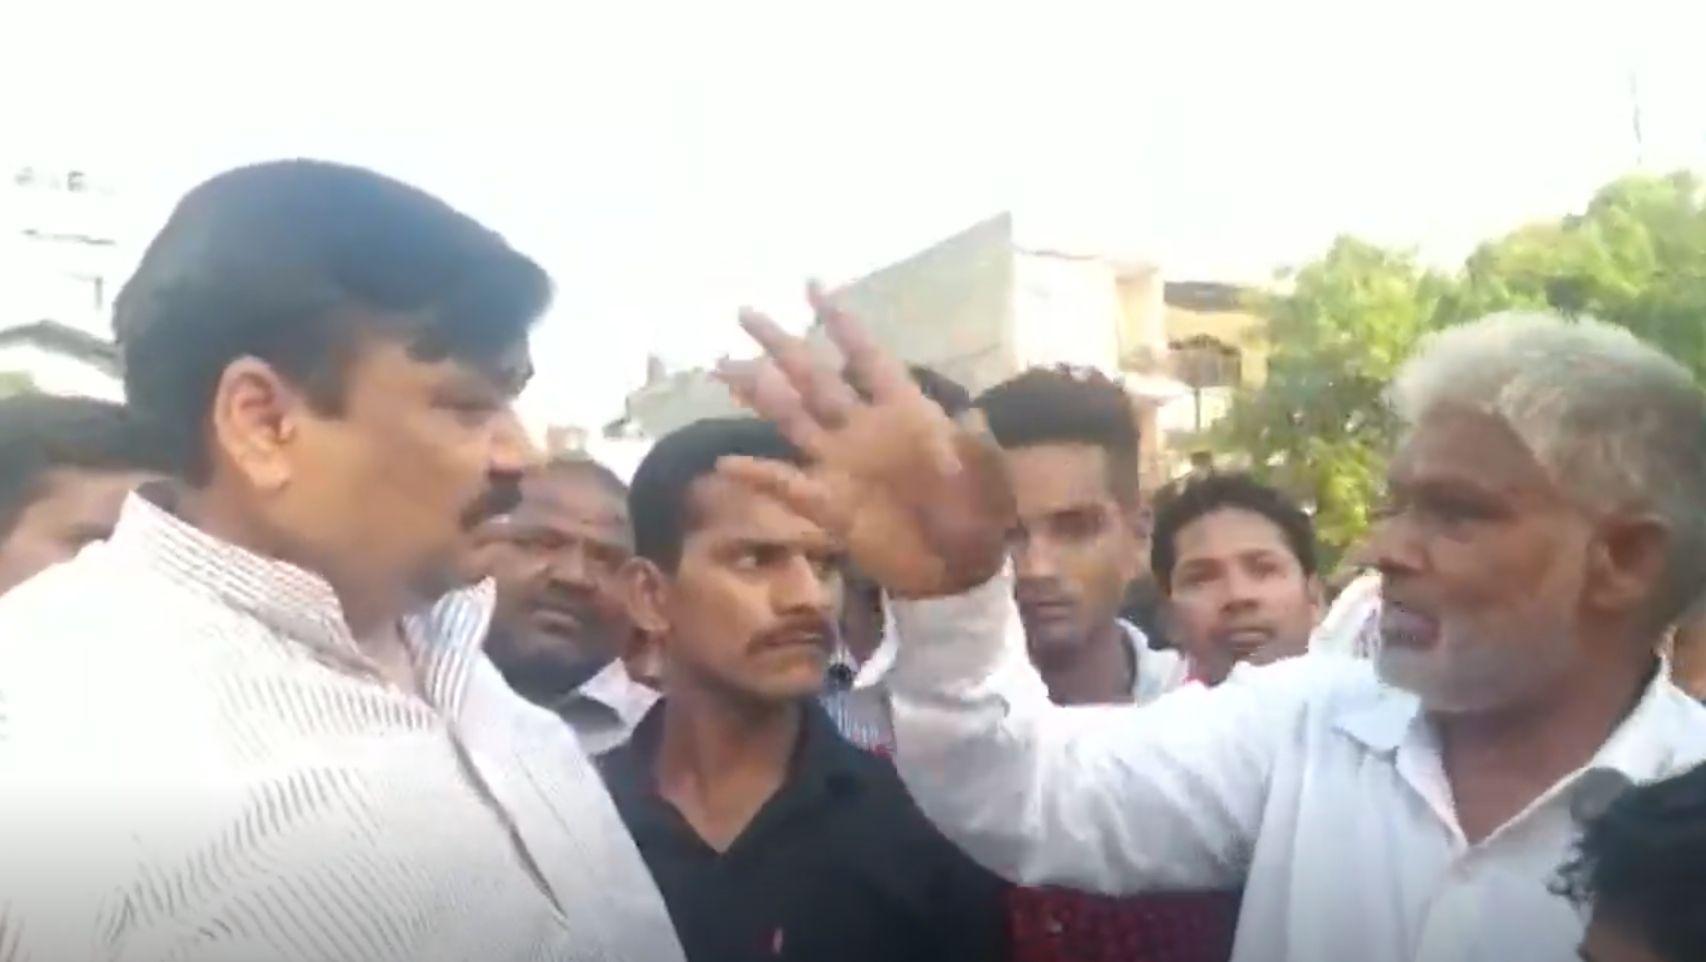 attack on muslim family aligarh hate against muslims - Satya Hindi